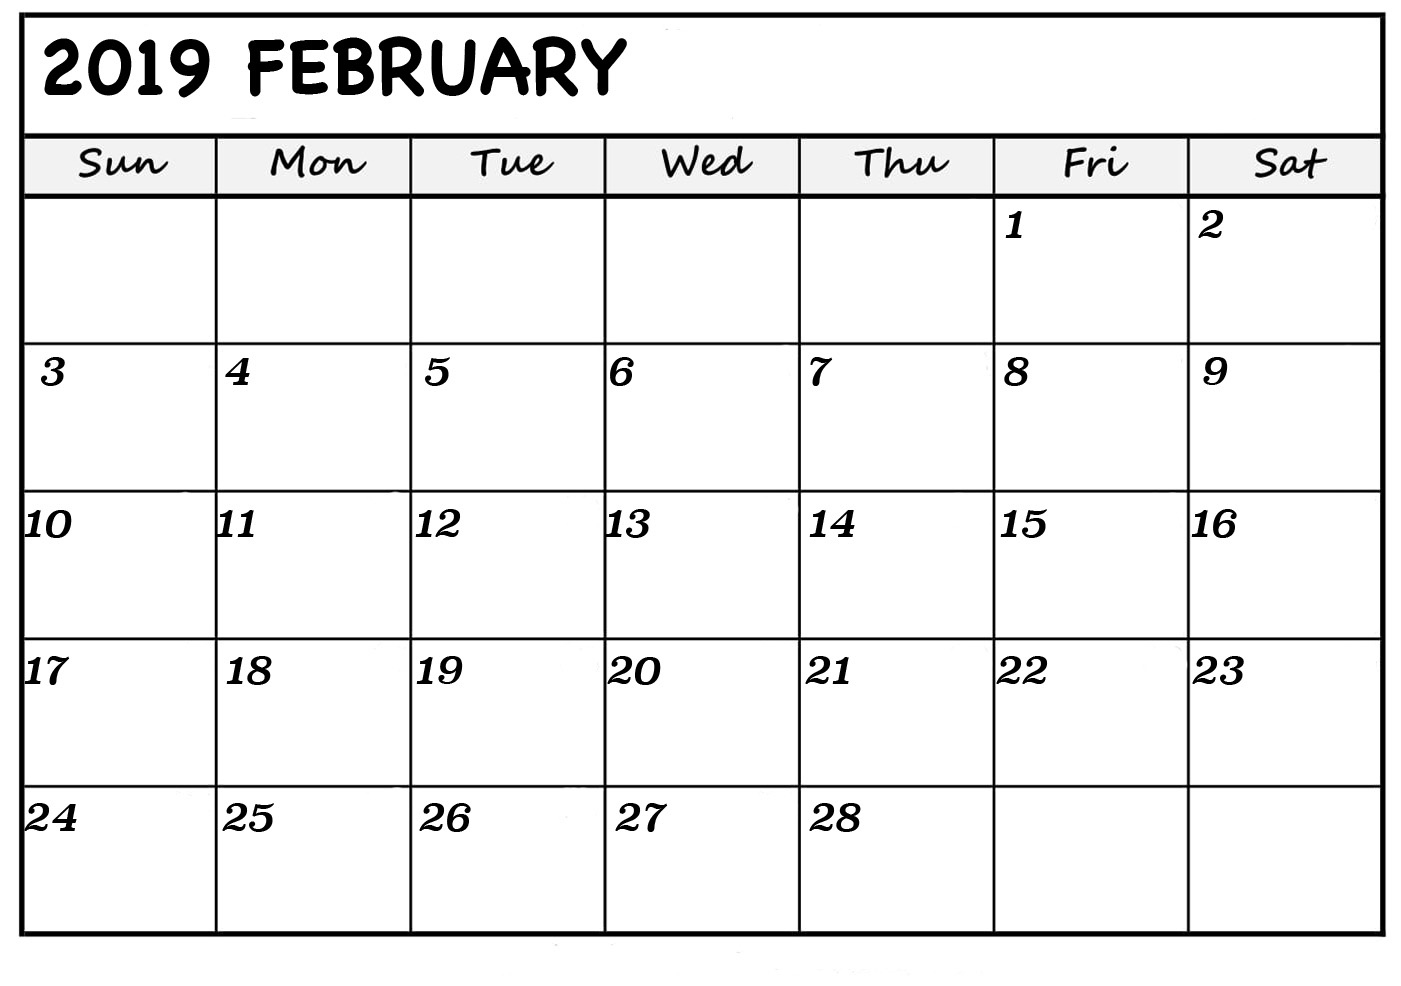 Print February 2019 Calendar In Portrait And Landscape Format